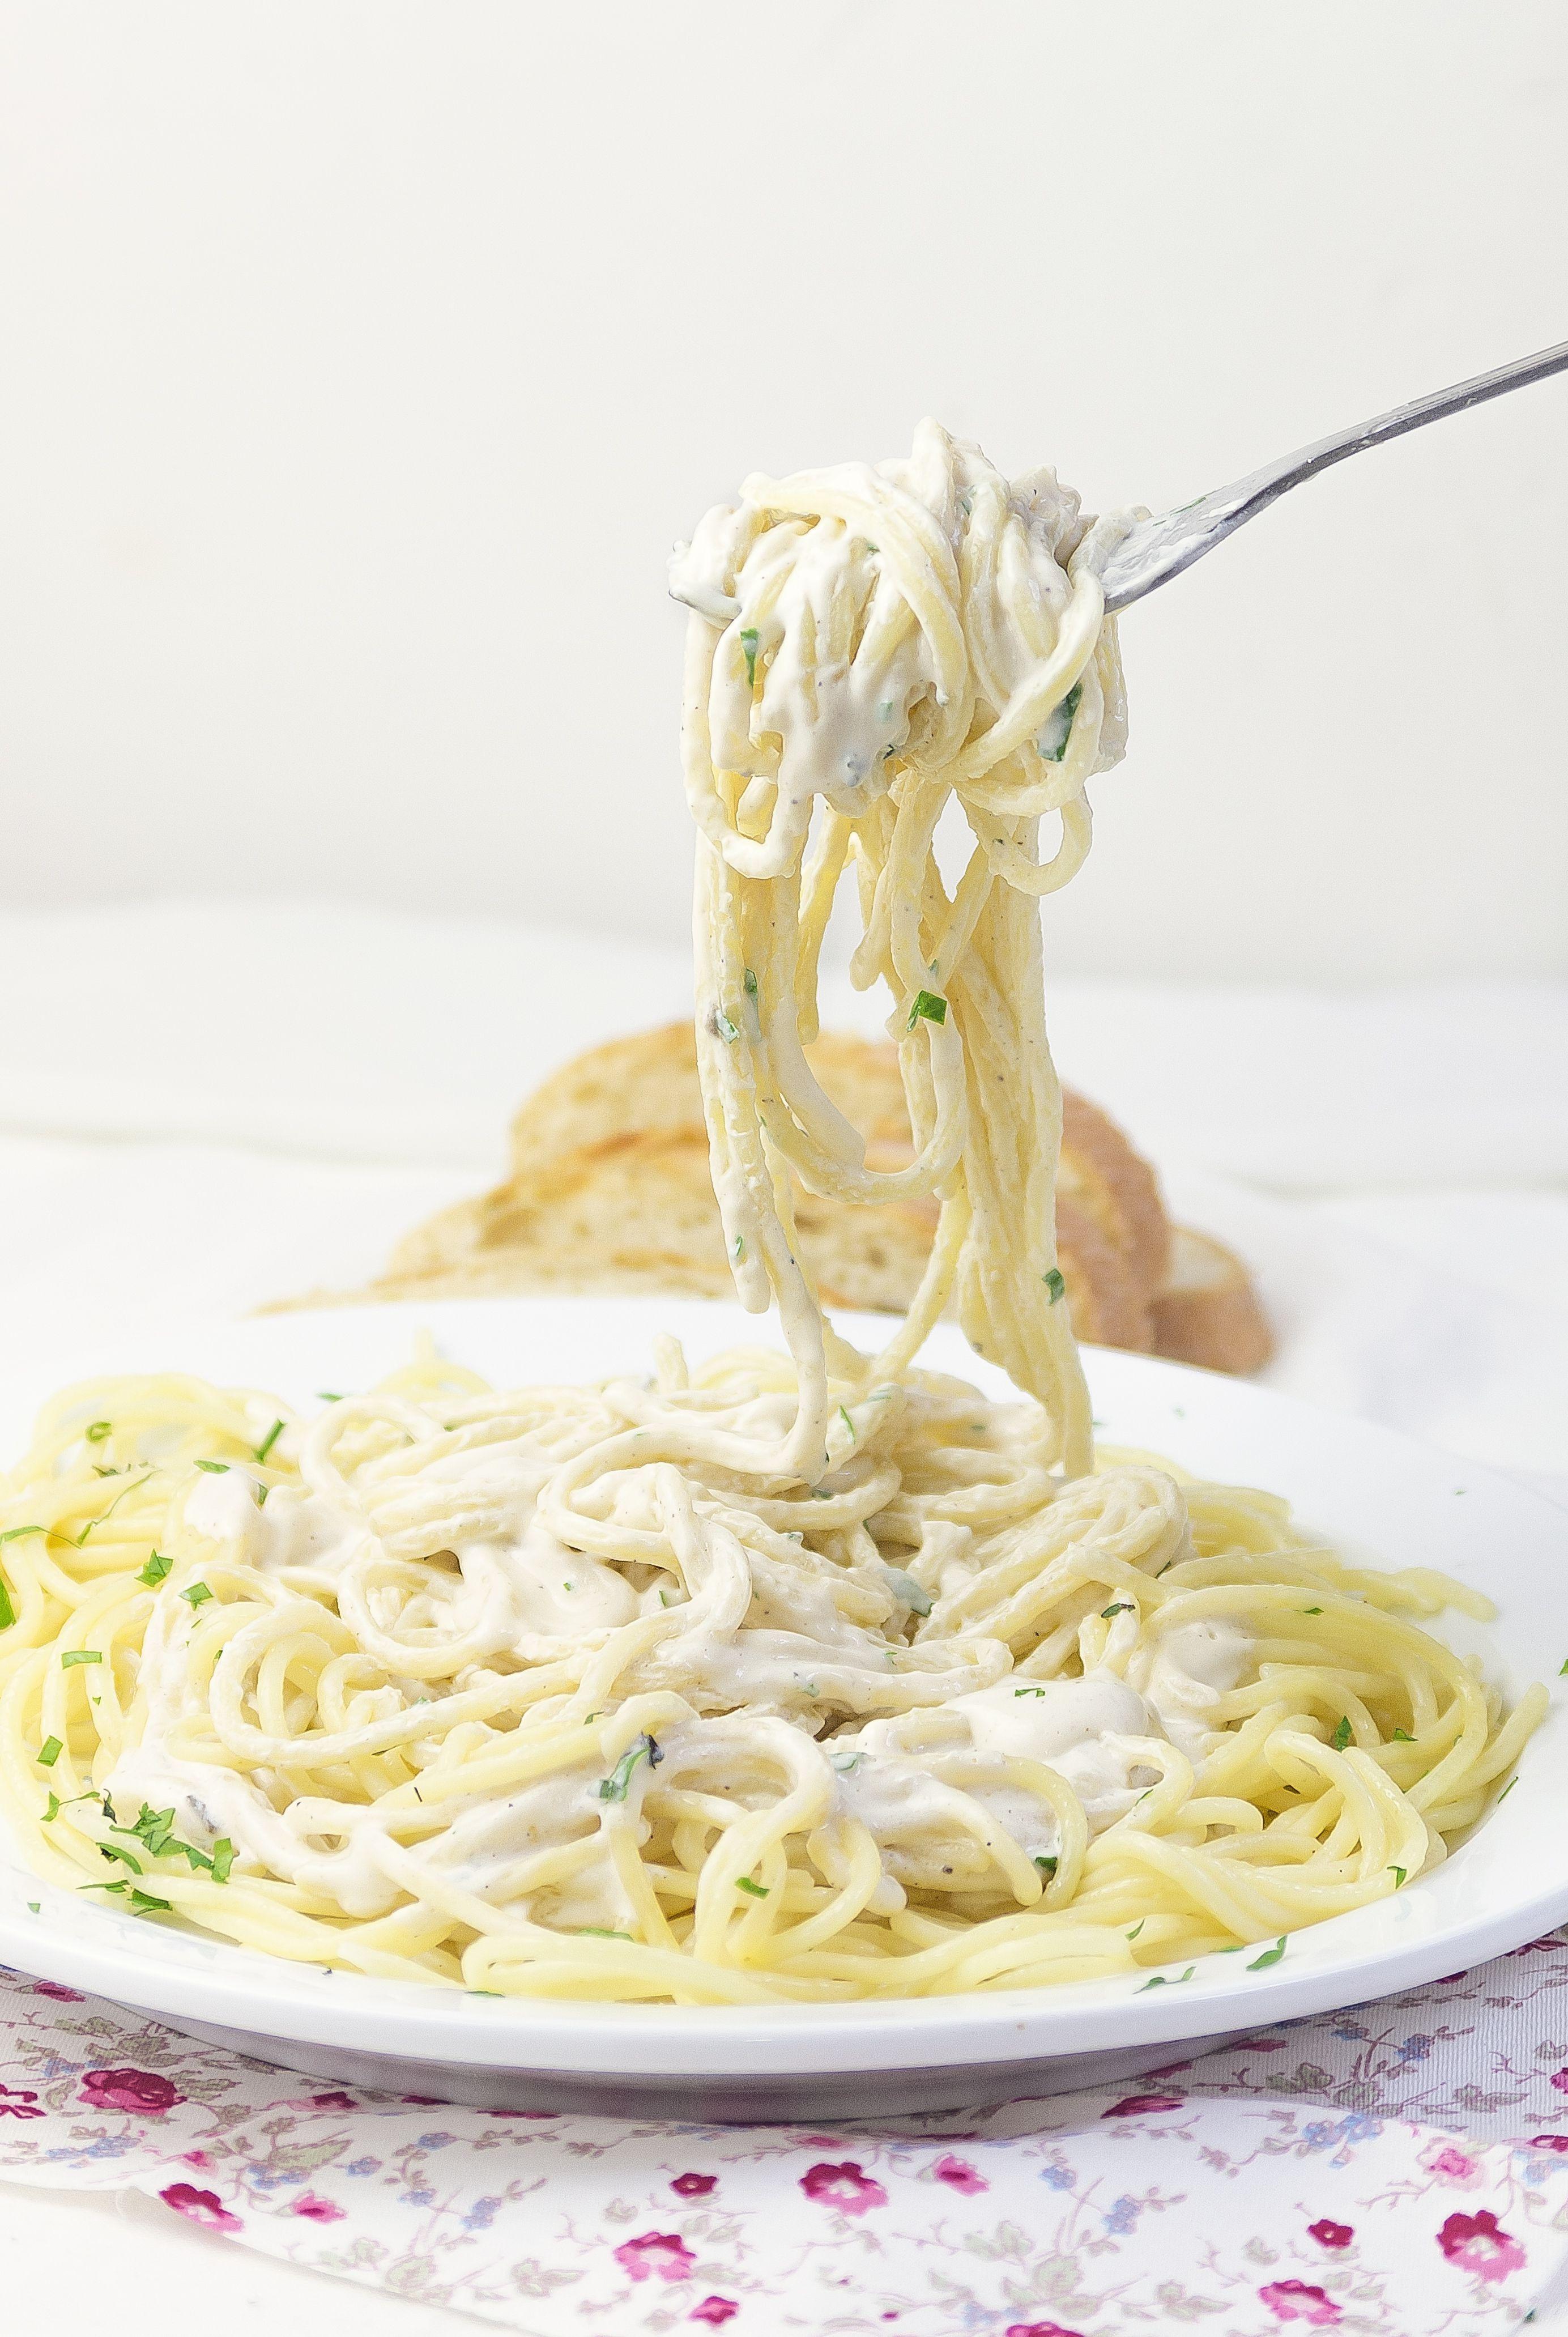 Easy Vegan Nutritional Yeast Pasta Recipe Recipe Nutritional Yeast Recipes Dairy Free Pasta Vegan Recipes With Nutritional Yeast